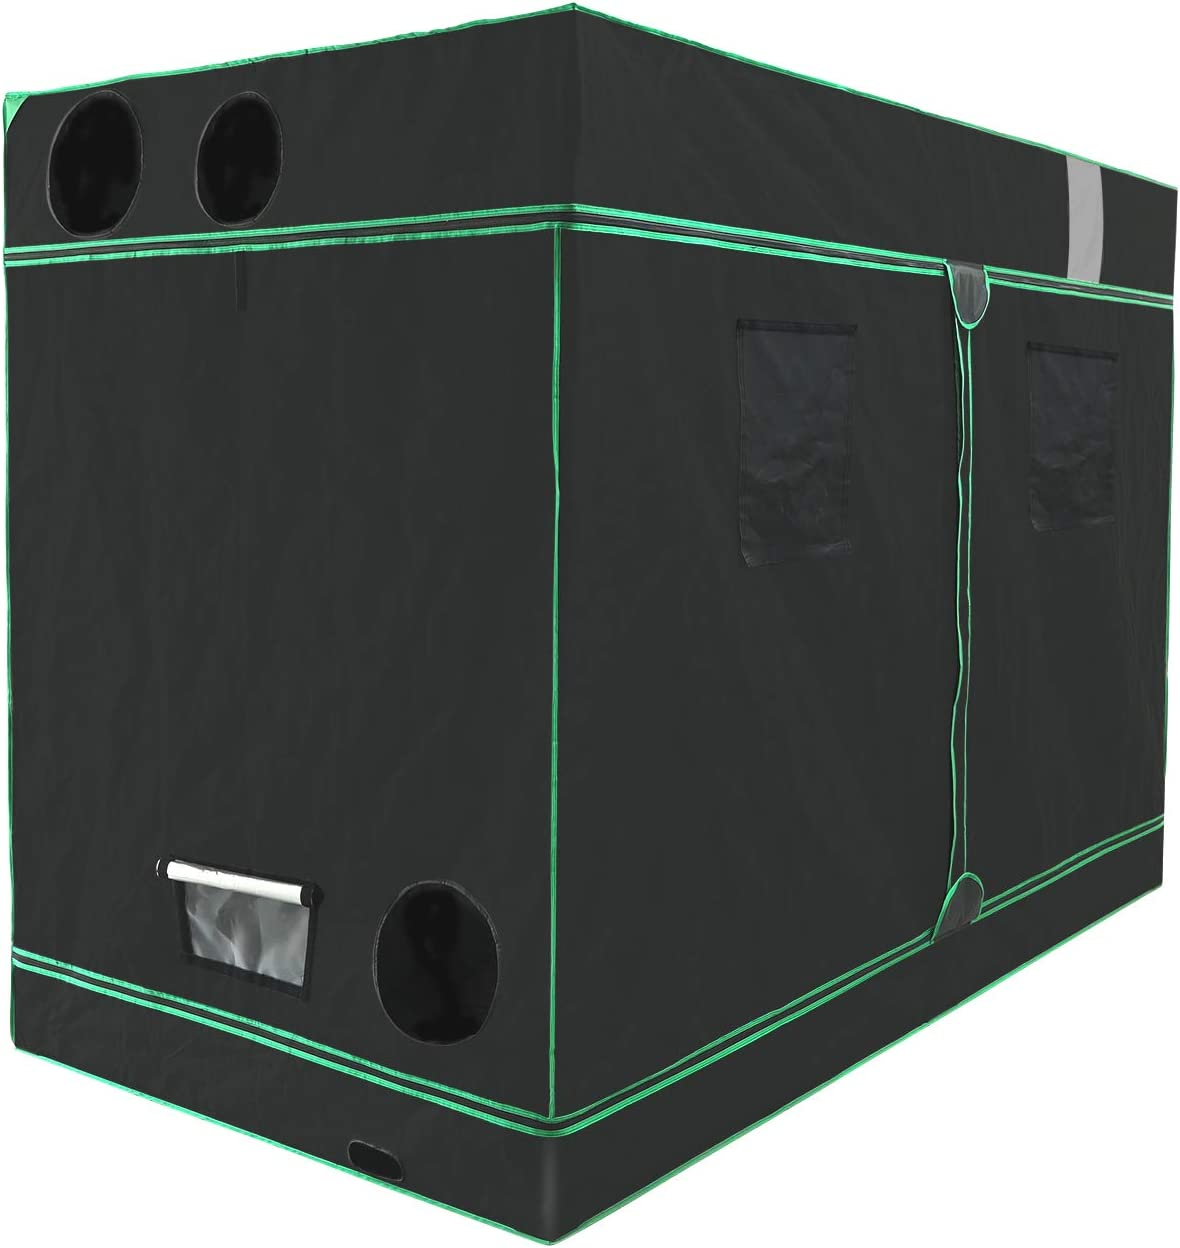 HORTIPOTS Grow Tent 4x8 Revolutionary Fix-onto-Pole Side Support Bars 48x96x79 inch Mylar Grow Room 120x240x200cm